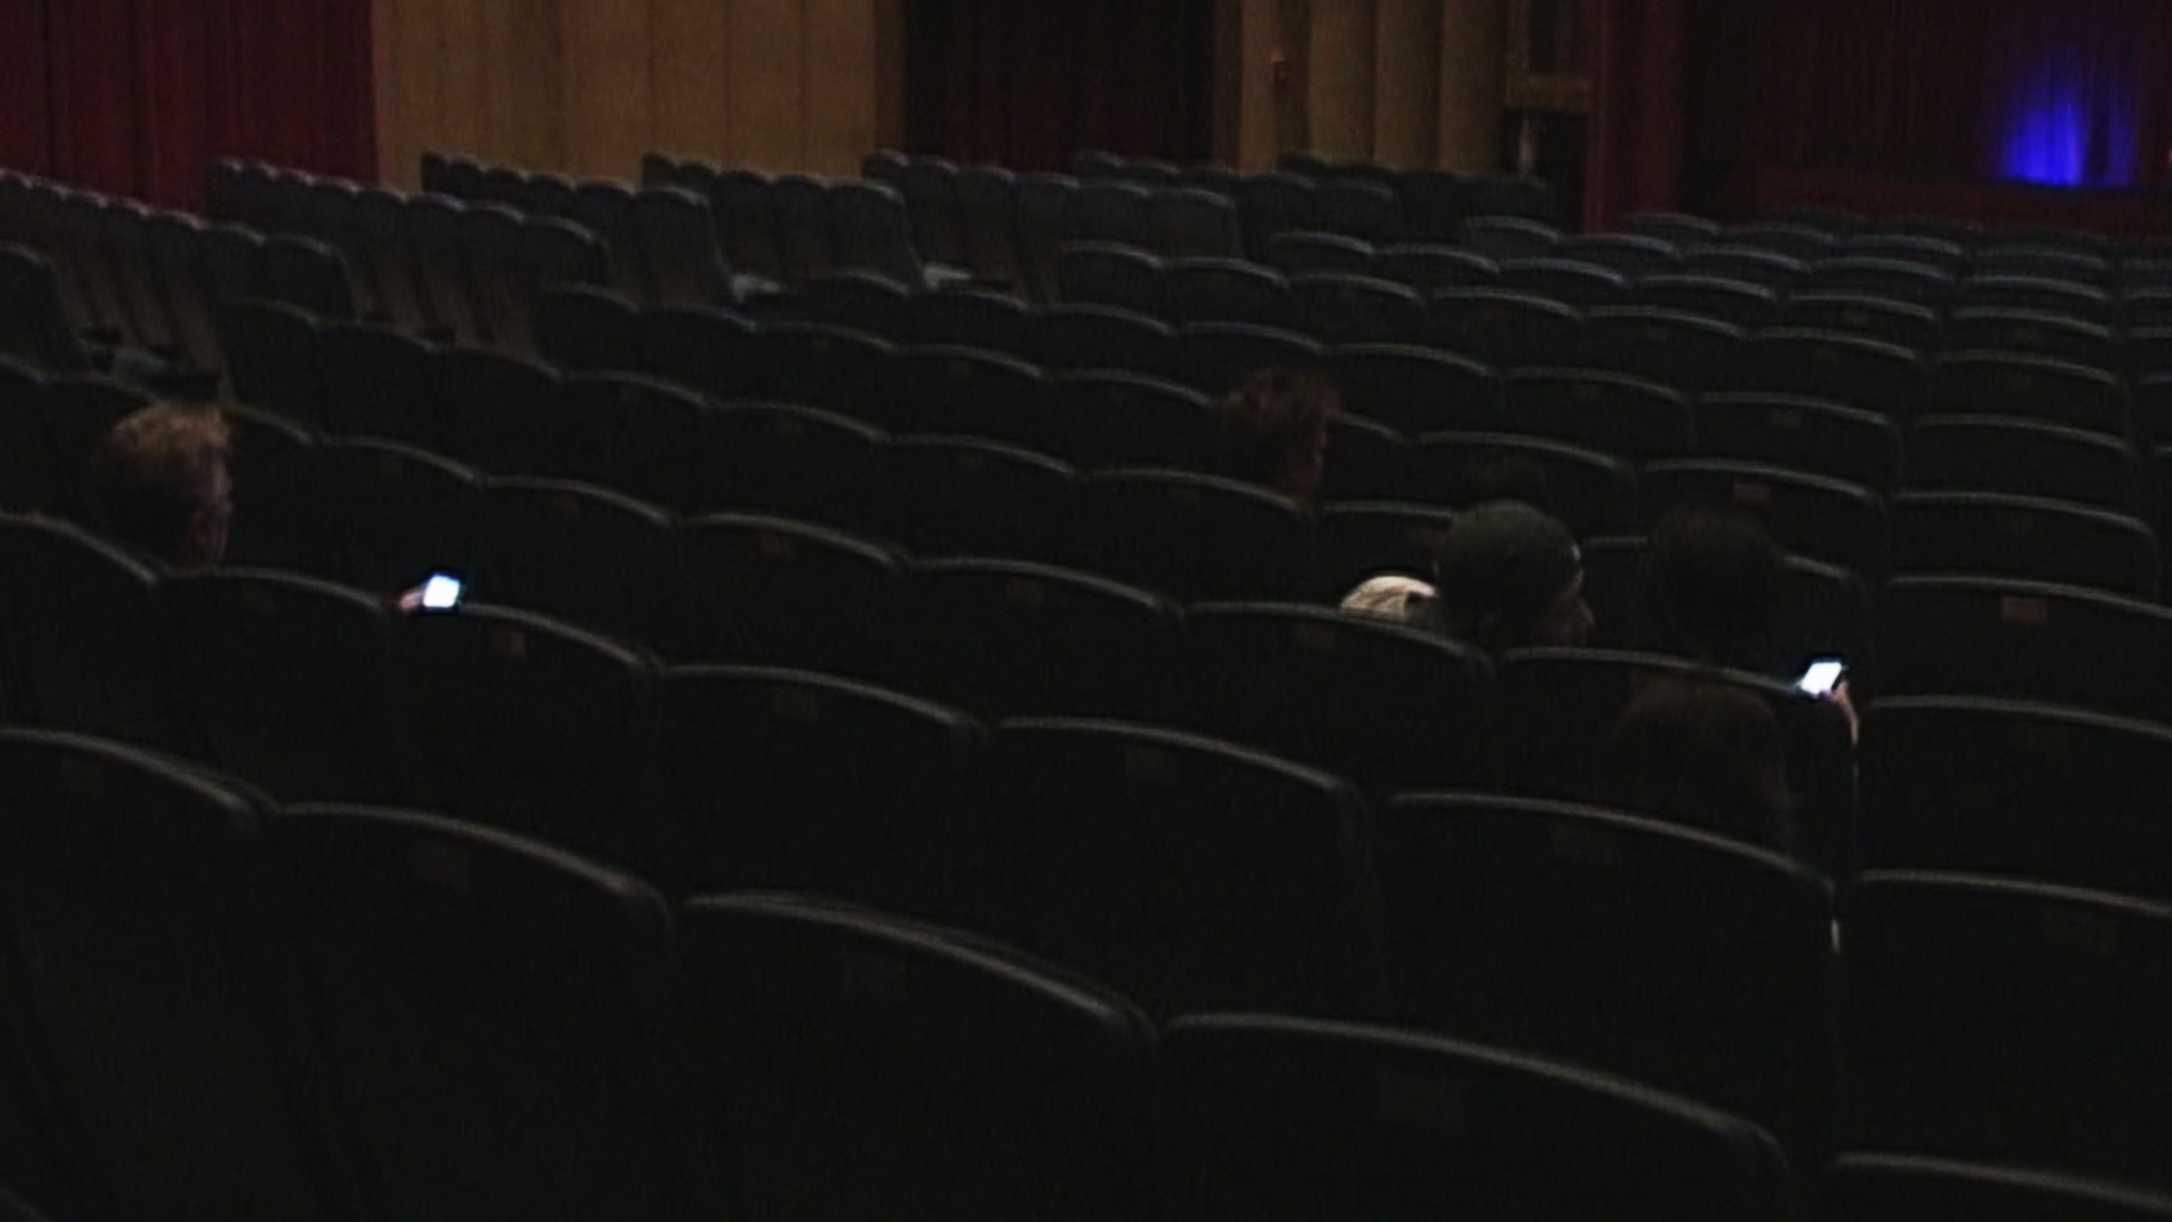 Smartphone screens light up inside the Nickelodeon Theater in Santa Cruz before a movie begins.